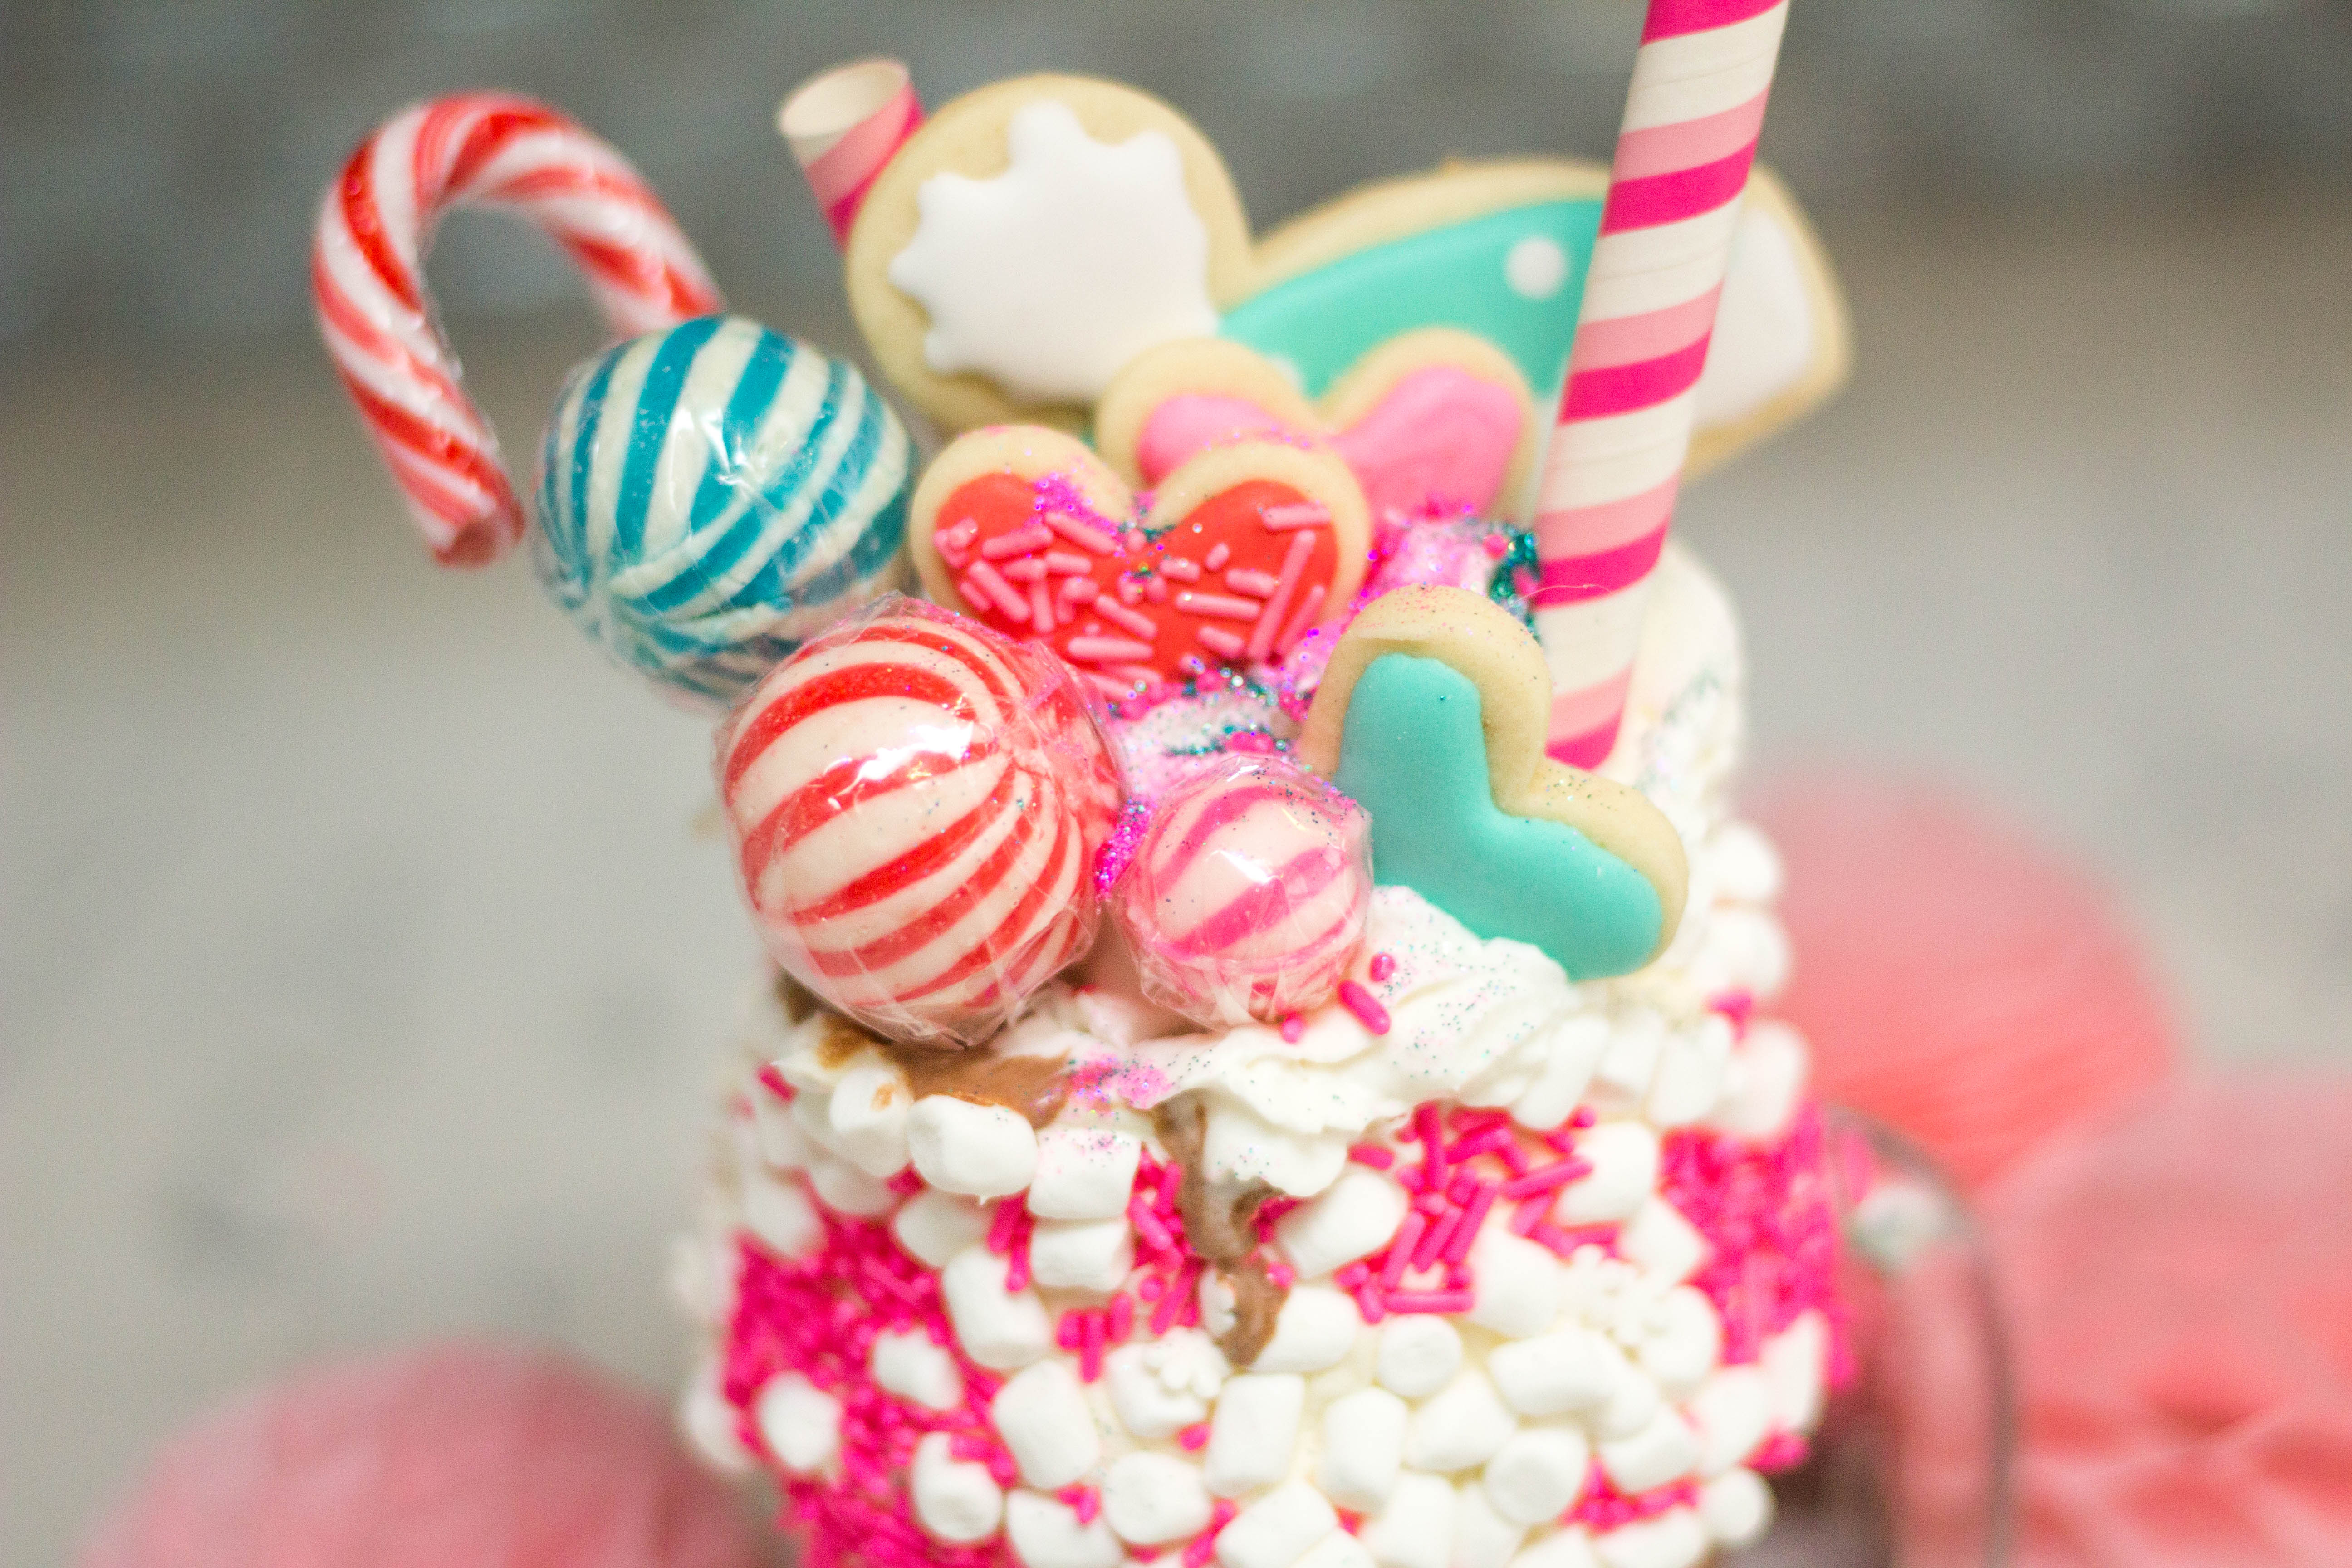 winter-baking-ice-cream-freak-shake-creative-desserts-overload-27